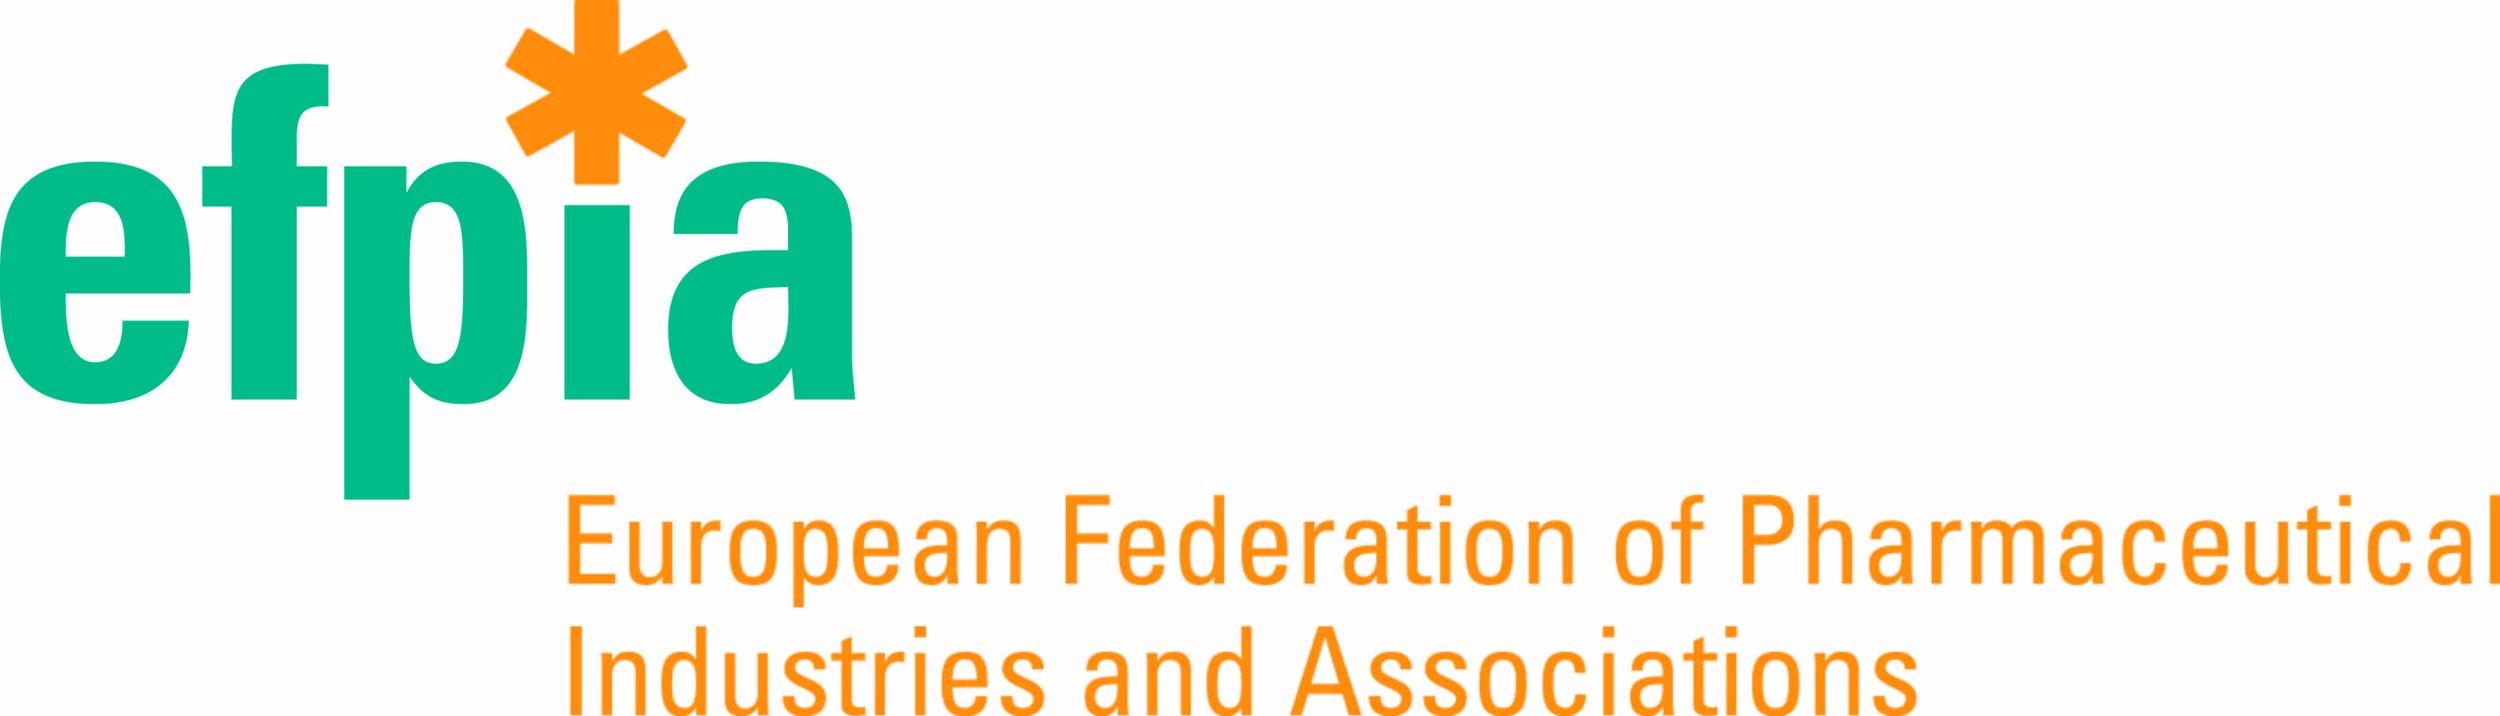 EFPIA-EU-Japan-EPA-Forum-trade-investment-M-and-A-Europe